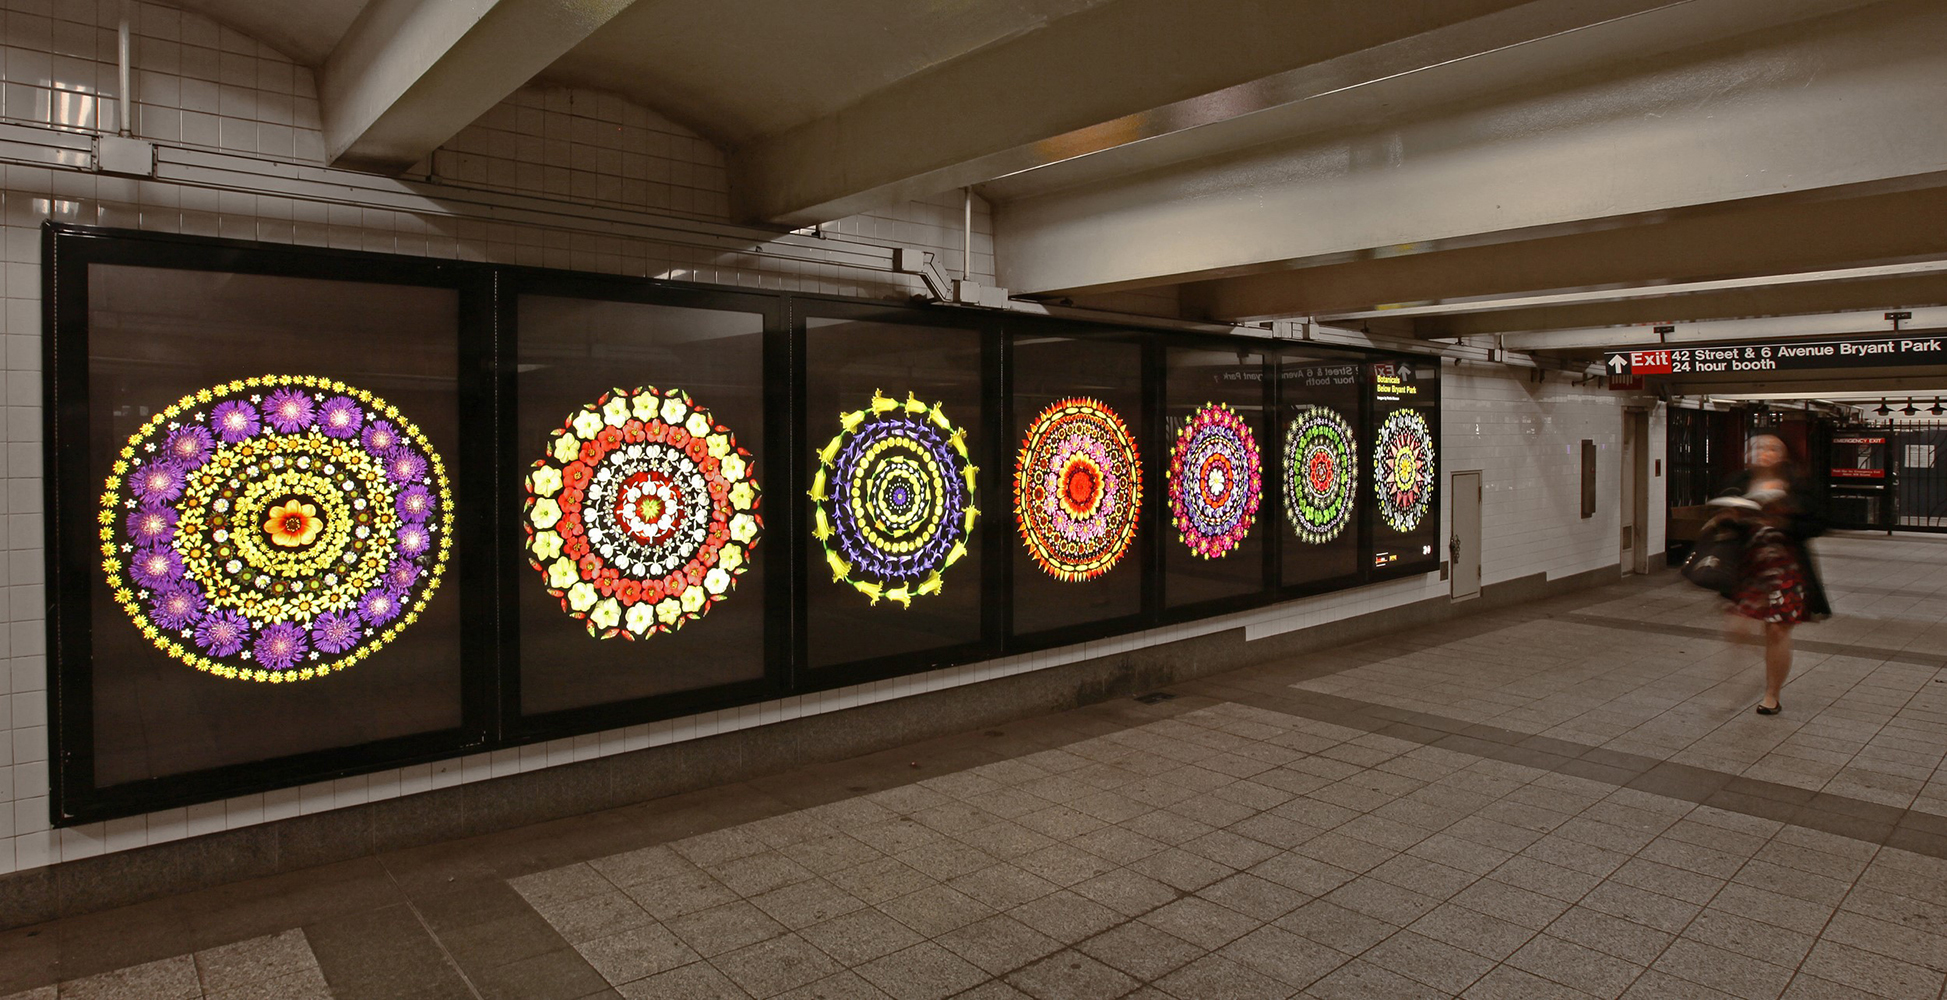 NYC MTA Arts for Transit,Bryant Park MTA Station, Portia Munson. Photo by Rob Wilson/MTA.